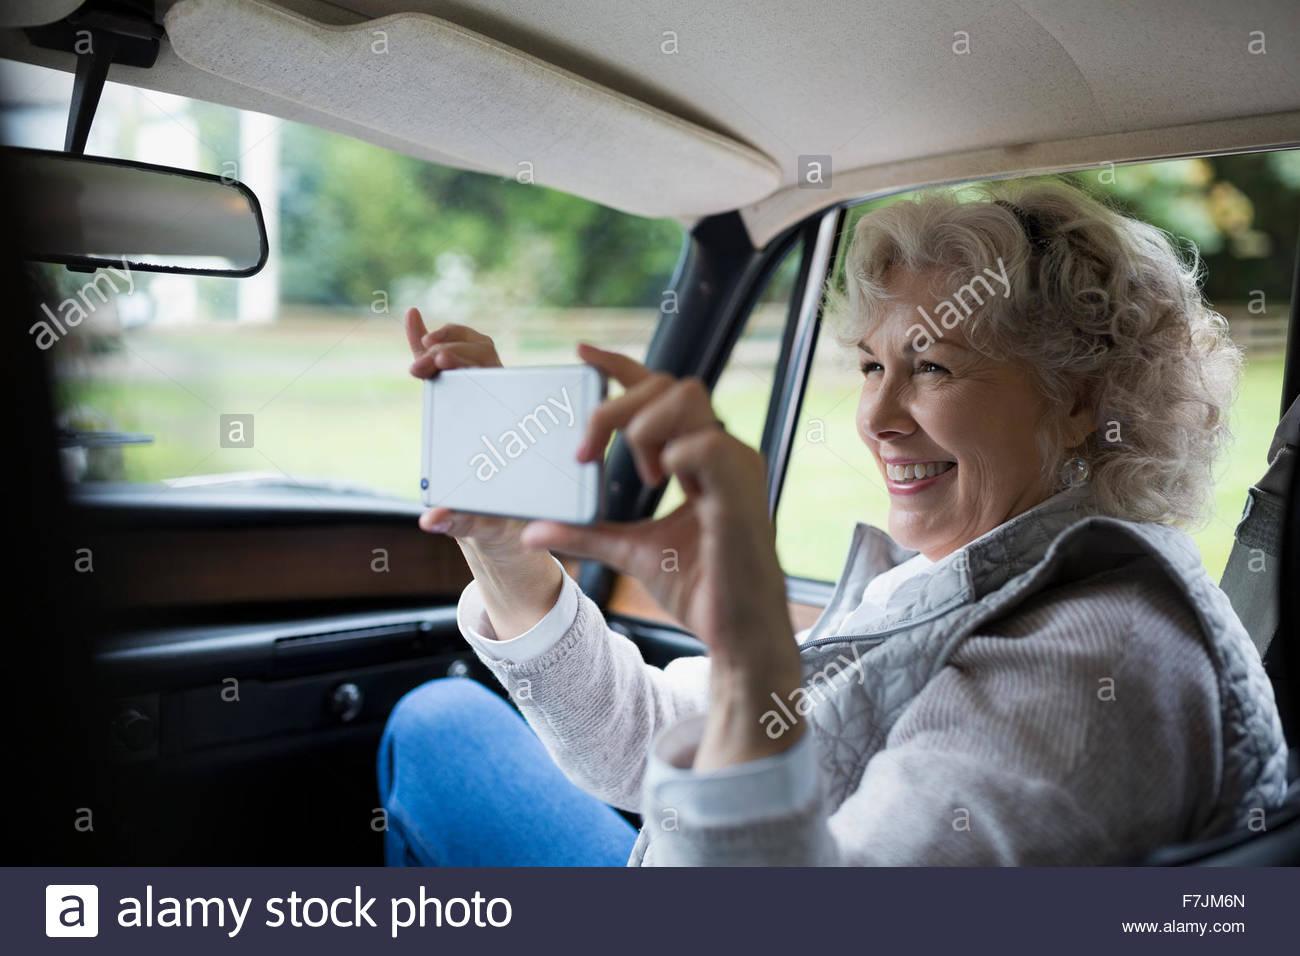 Senior woman using camera phone in car Photo Stock